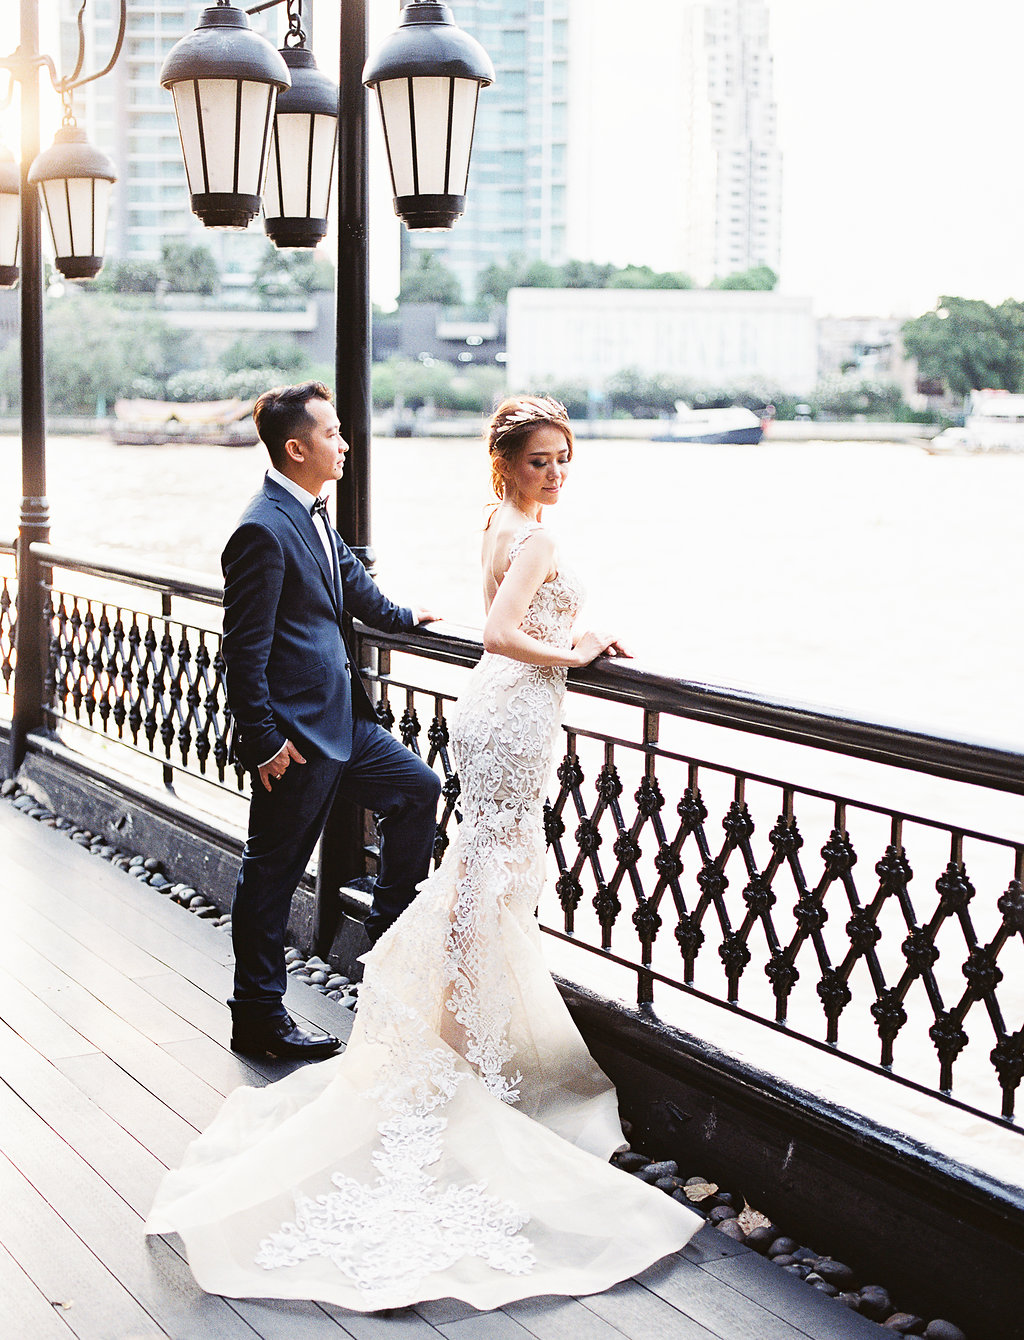 Luxe destination wedding in Jakarta and Bankok | fine art film wedding photographer Tanja Kibogo 5001.JPG